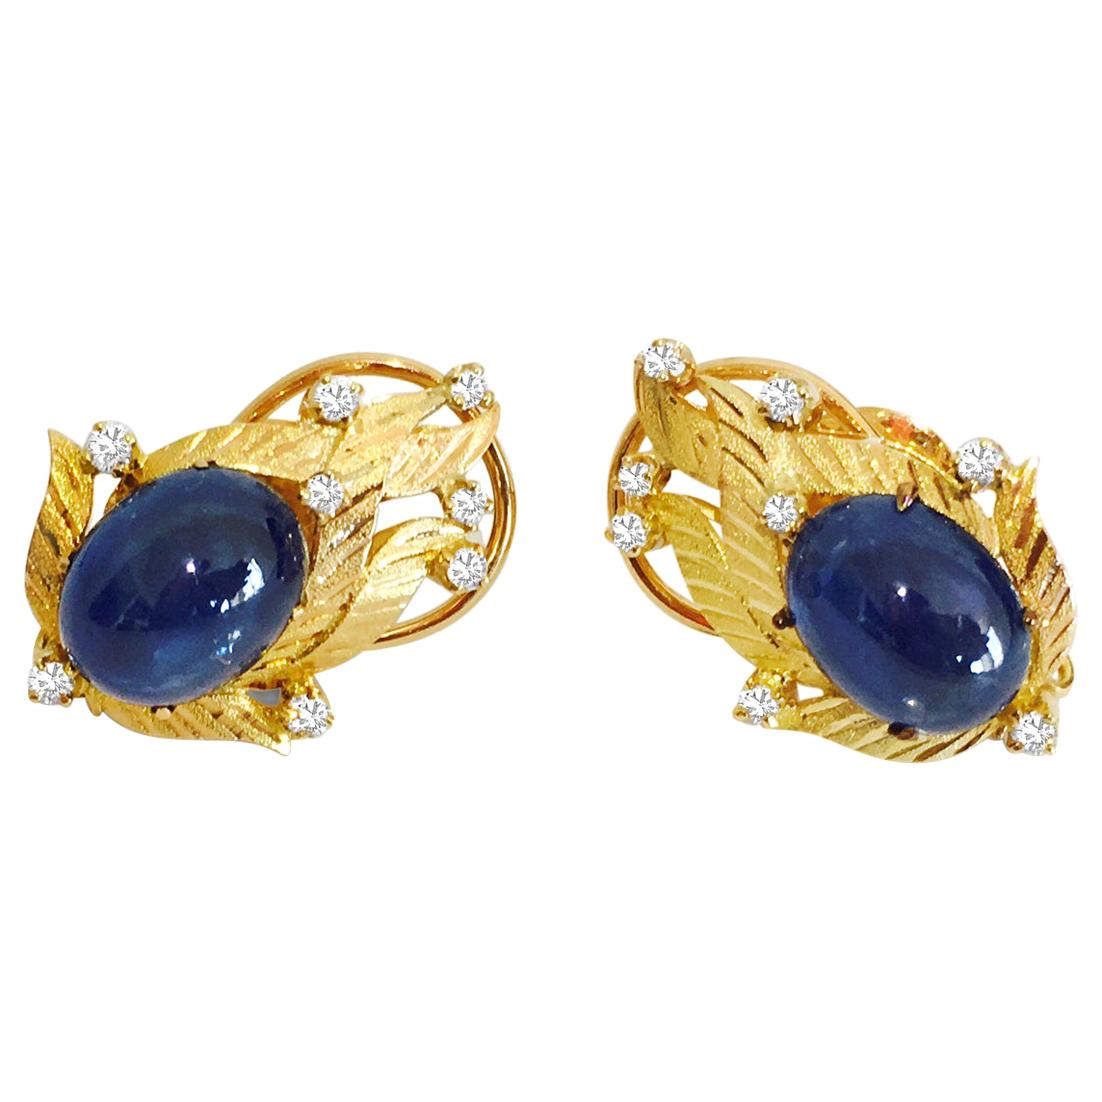 GIA Certified Vintage Cabochon Blue Sapphire Diamond Earrings